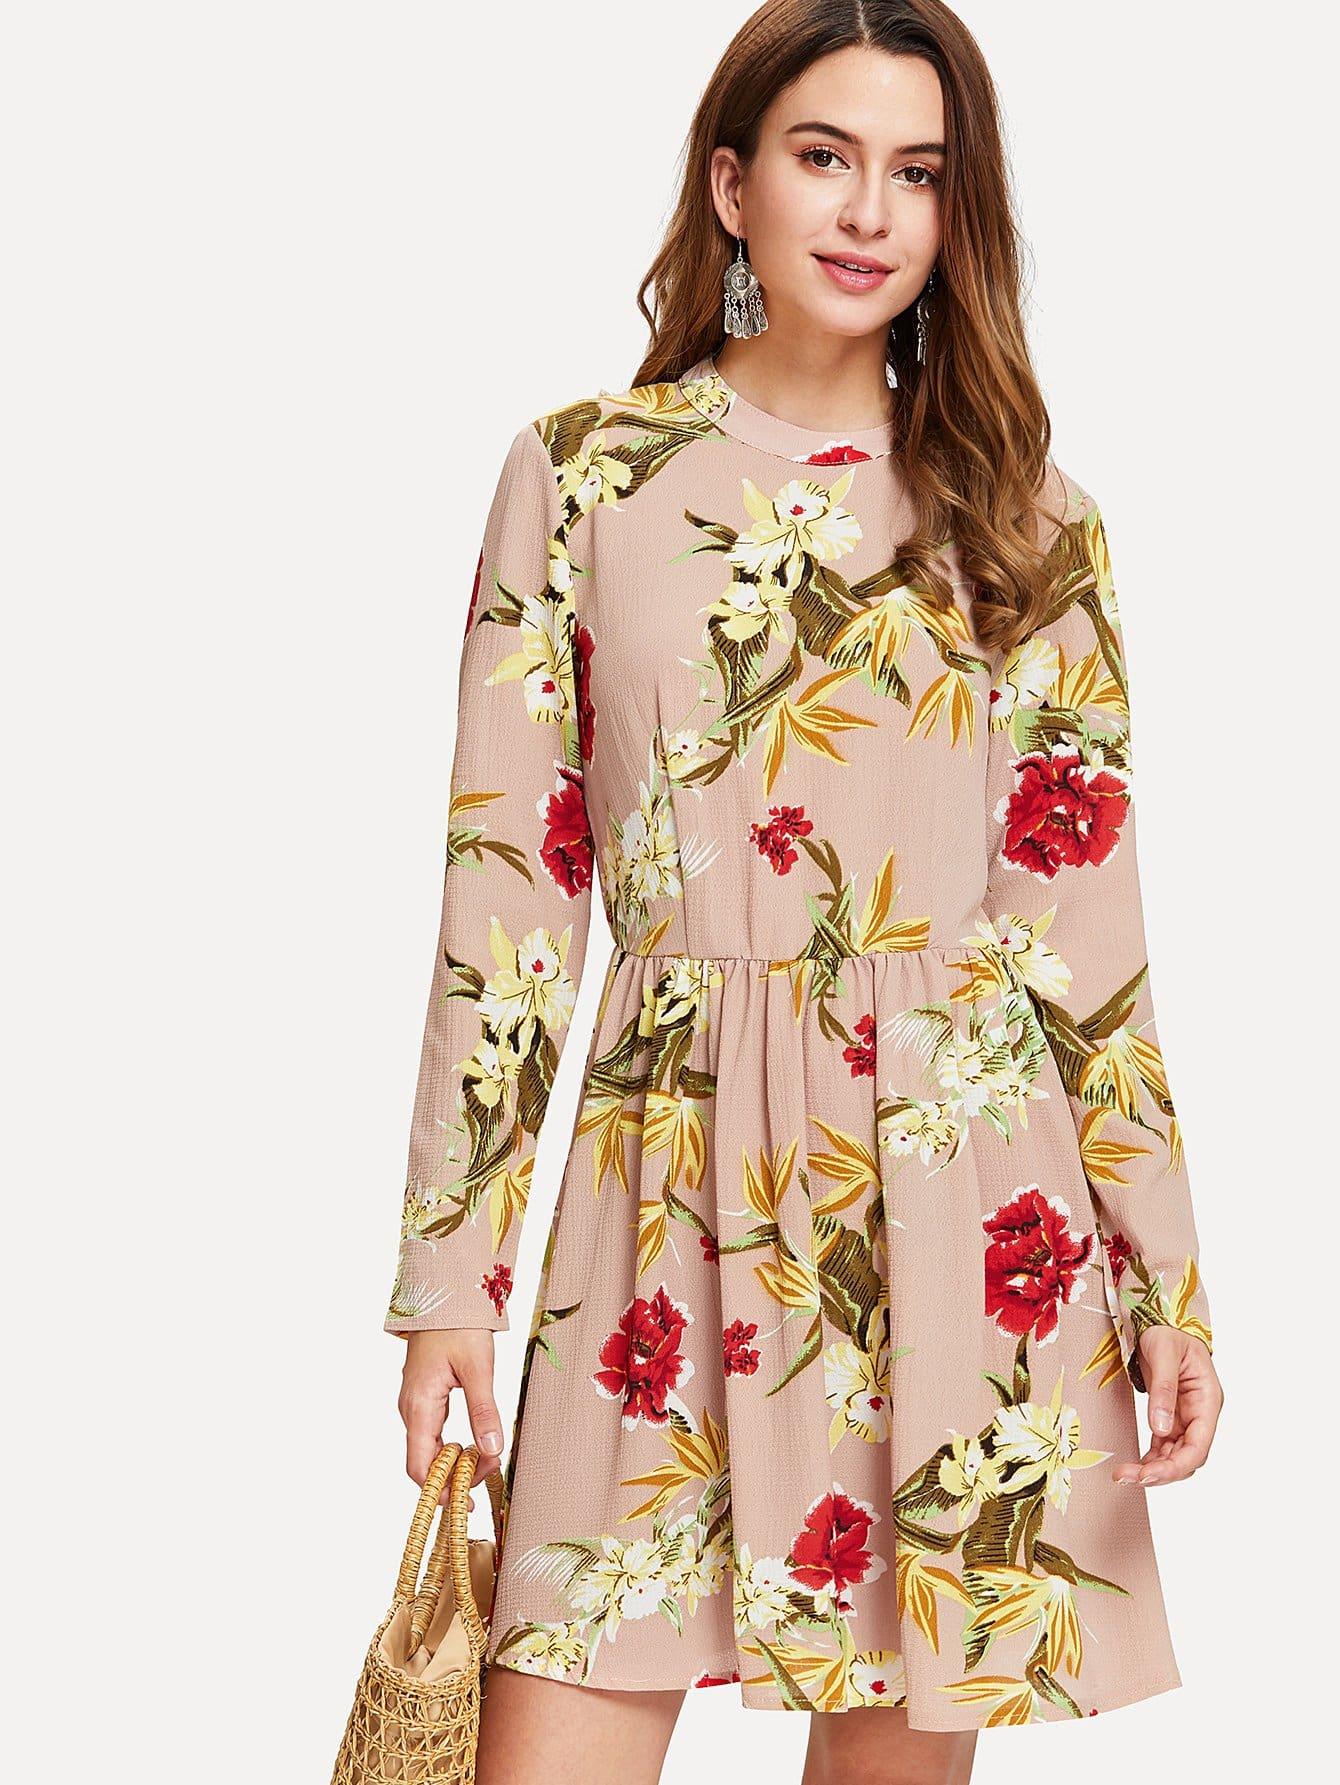 Flower Print Smock Dress corduroy babydoll smock dress